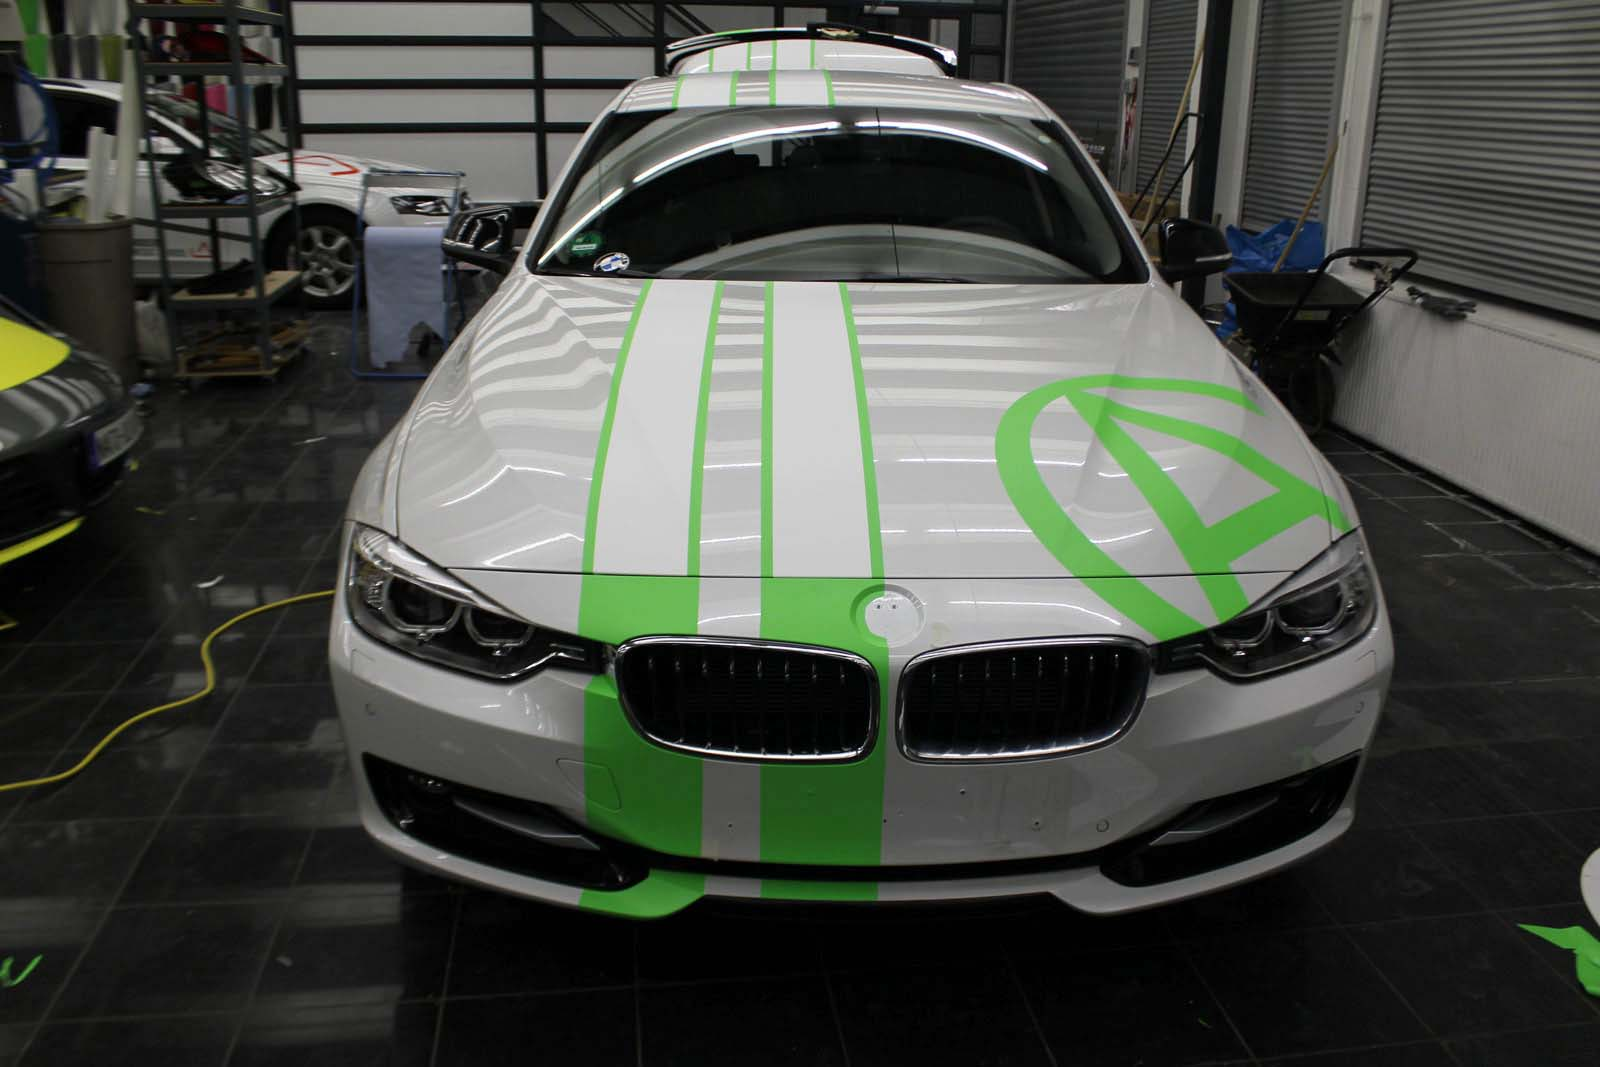 BMW_3ER_RALLYESTREIFEN_WEISS_GRUEN_MATT_MIT_BRANDING_05